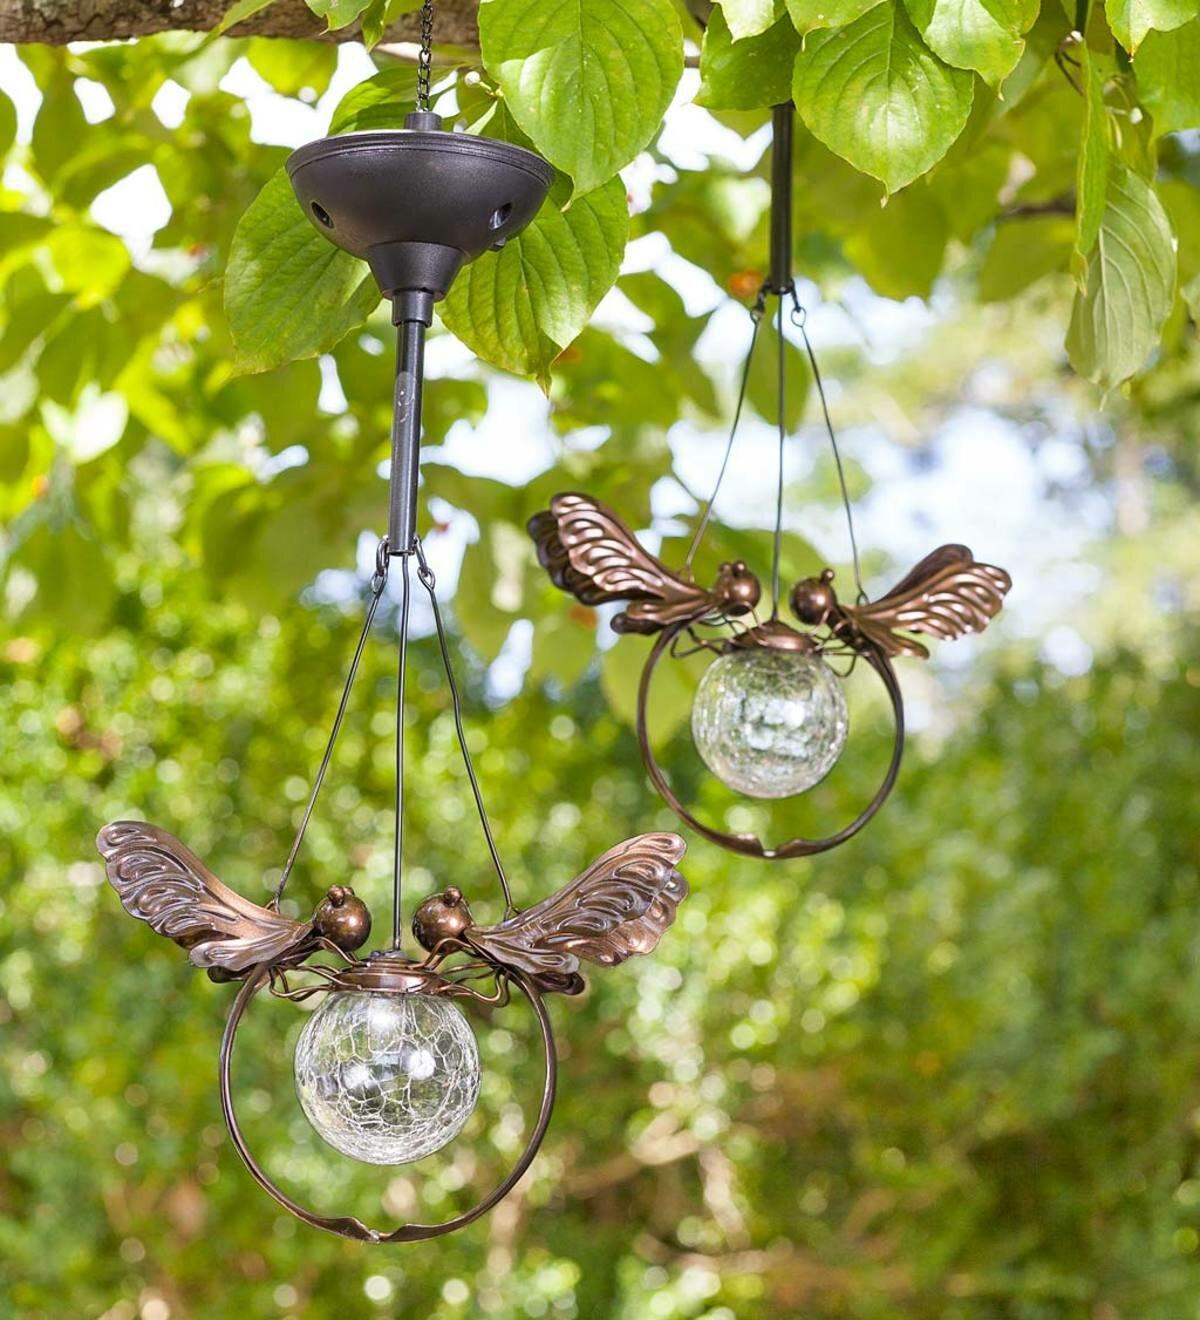 Wind Weather Solar Gl Le Ball Dragonfly Light 2 Piece Decorative Lantern Set Reviews Wayfair